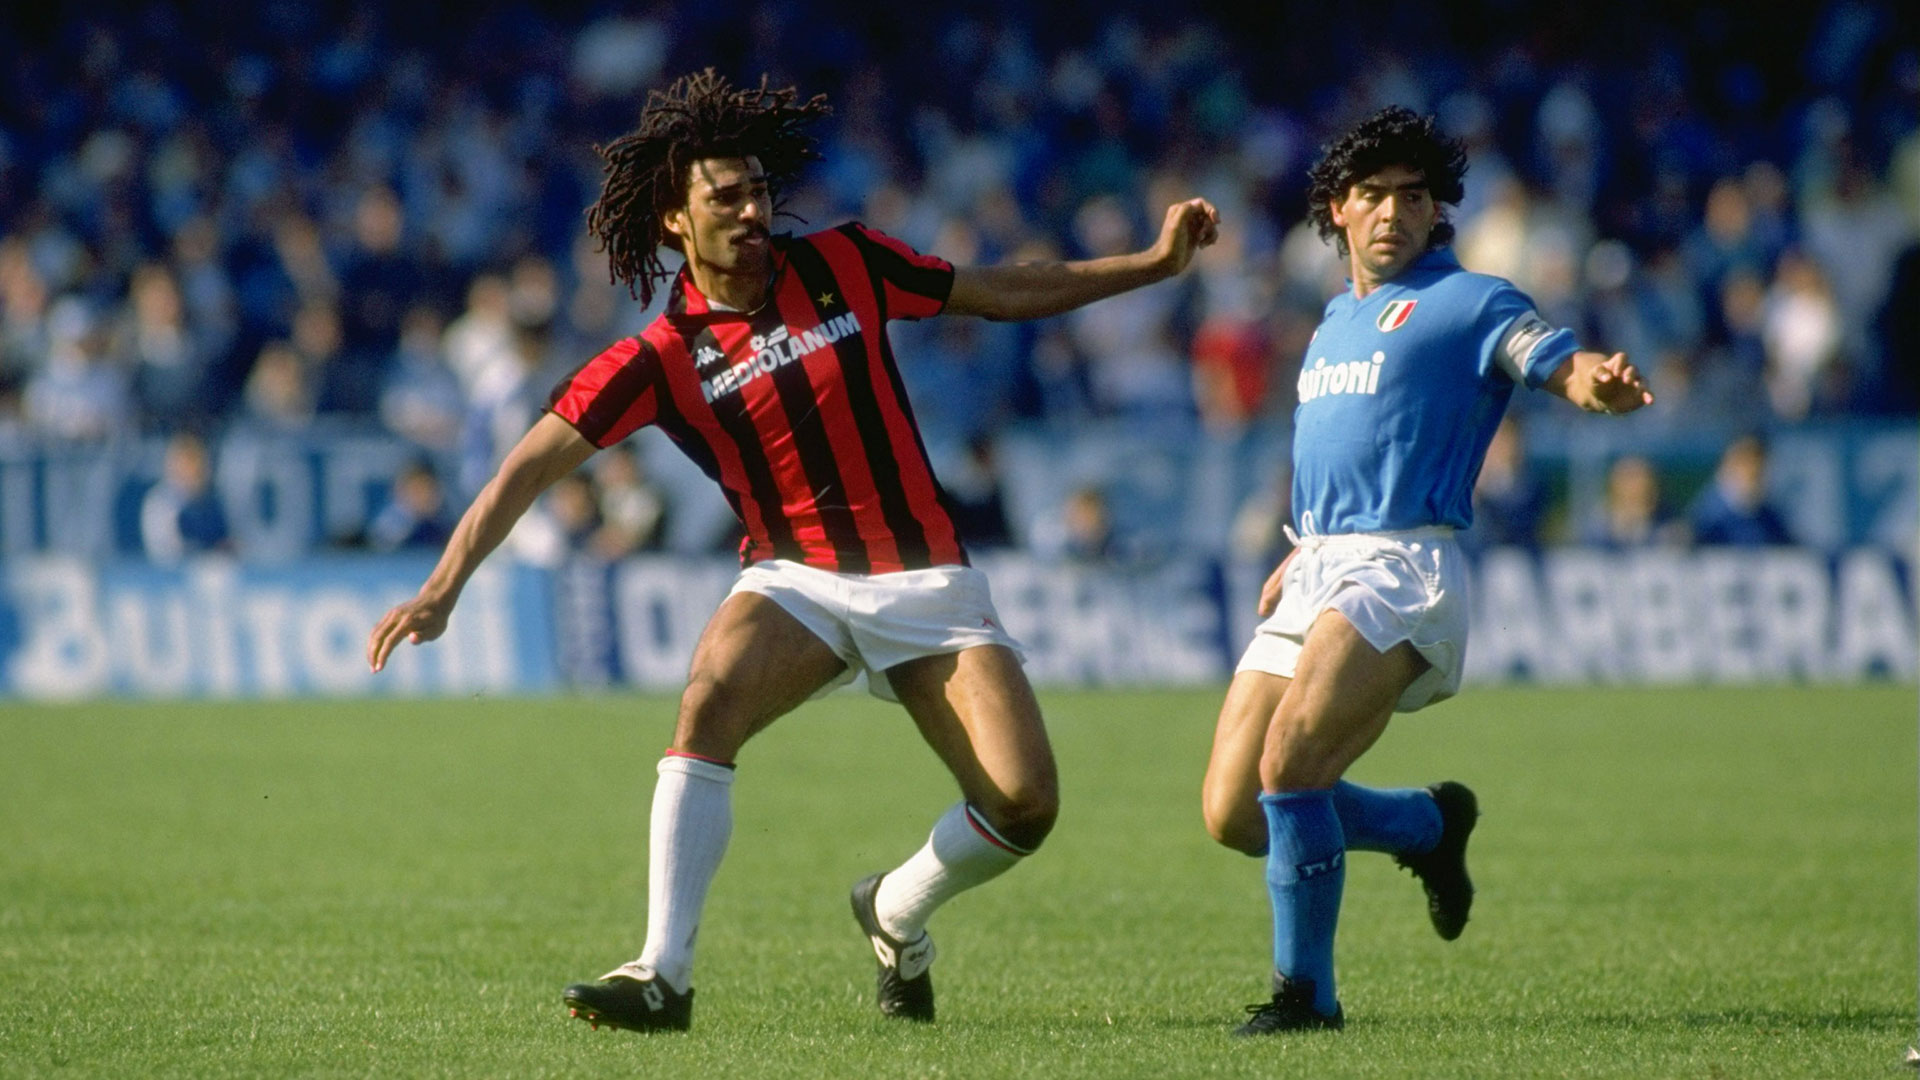 Ruud Gullit Diego Maradona AC Milan Napoli Goal